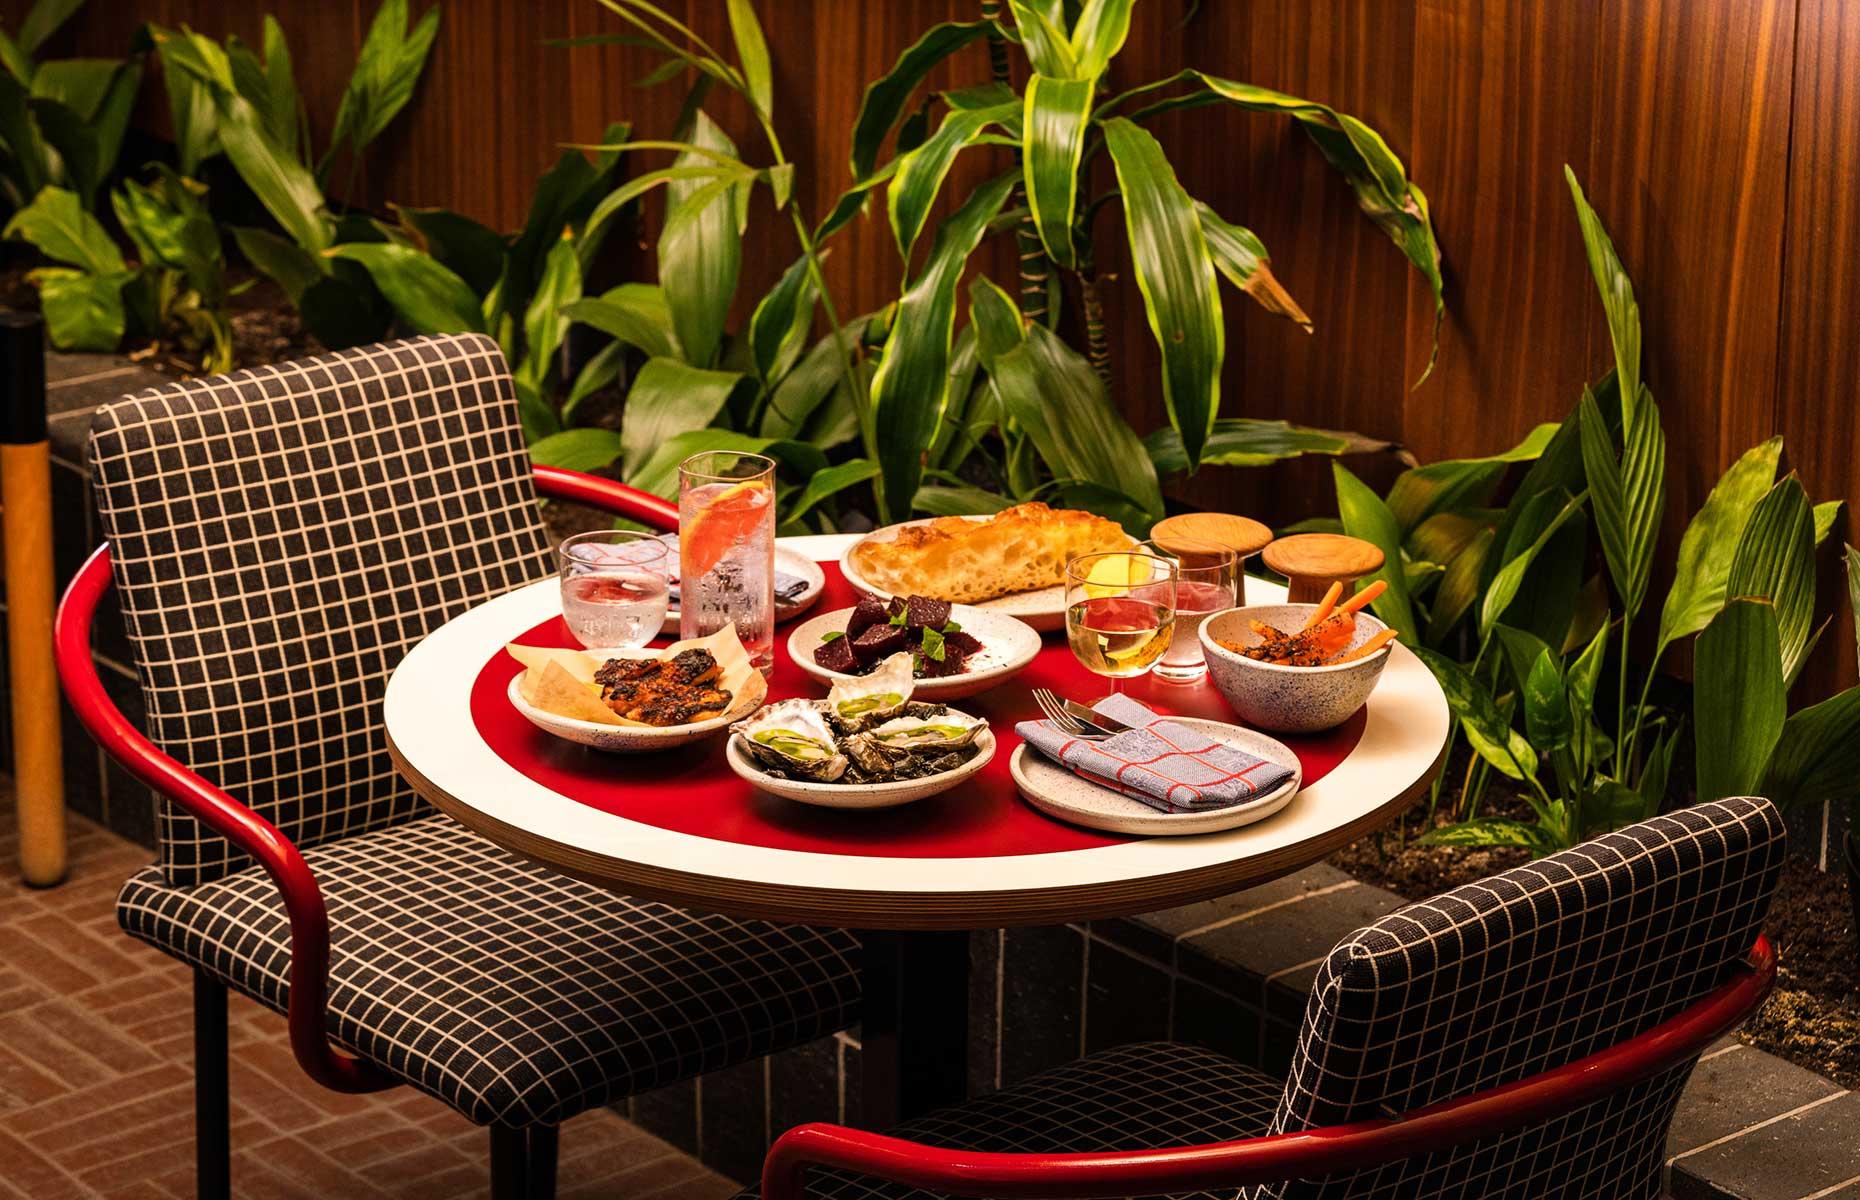 Food at Isla, The Standard (Image: Hayden Perrior/The Standard)